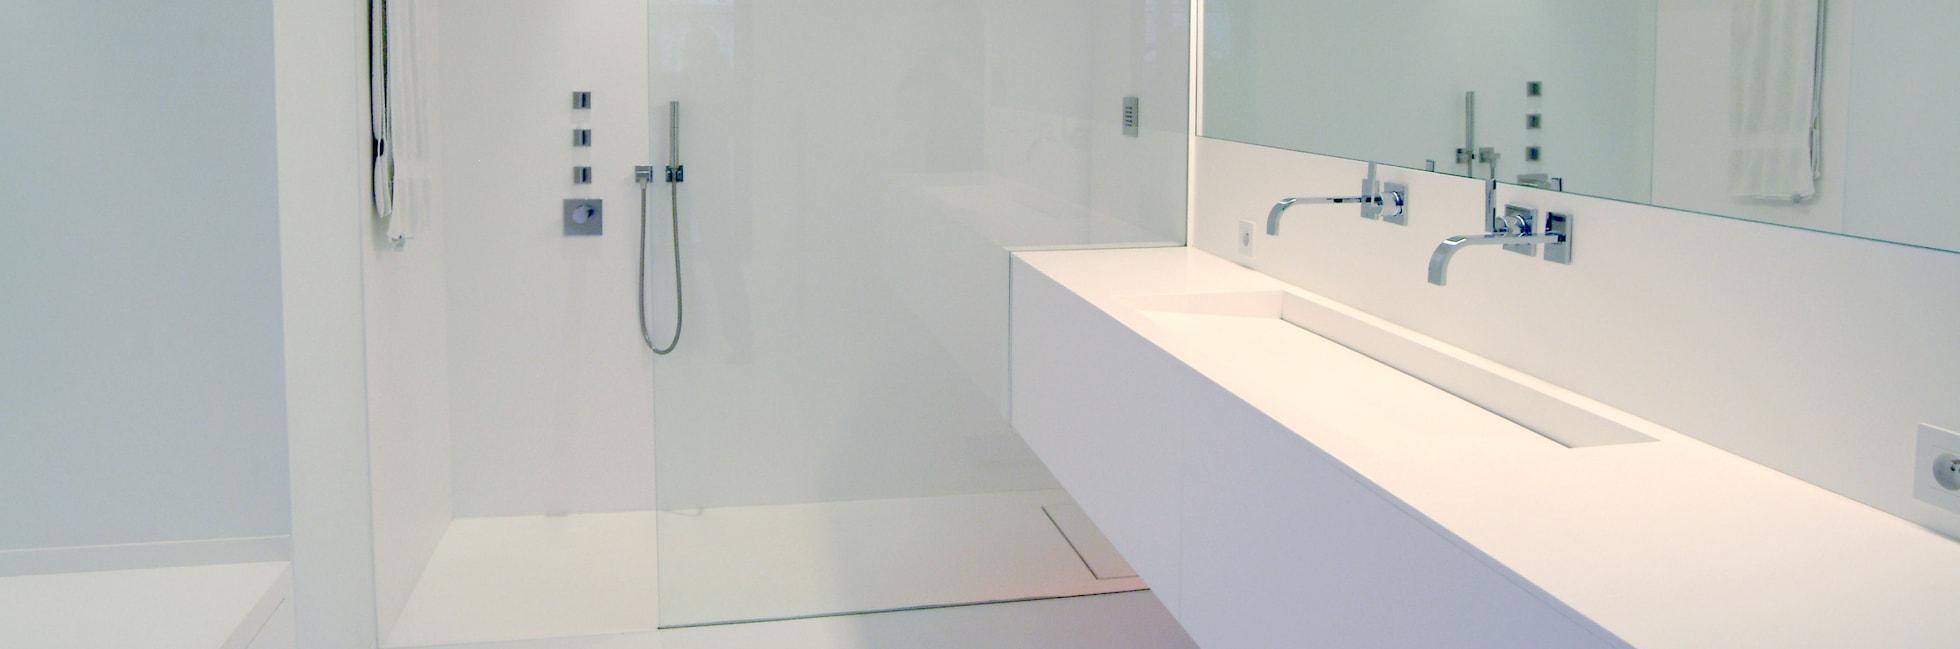 Uw badkamer, hedendaagse luxe – GF Concepts : GF Concepts